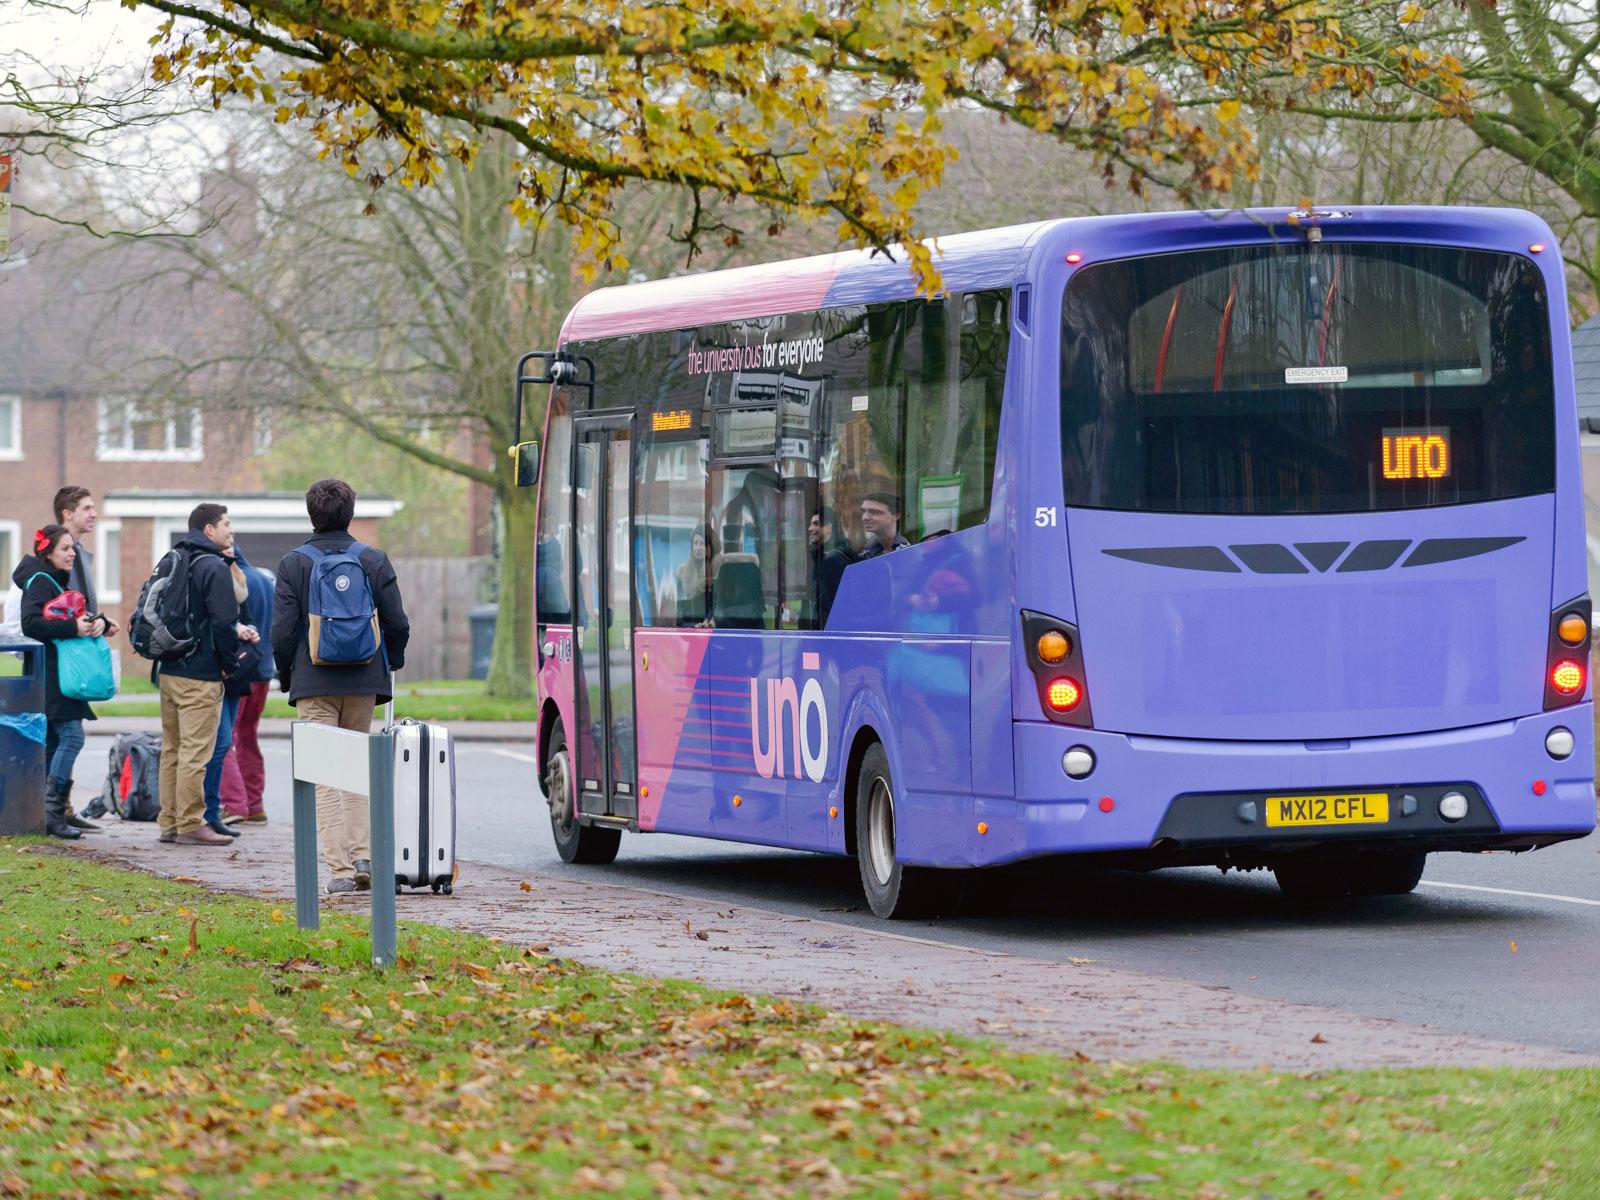 Cranfield University Blogs | Transport links between London and